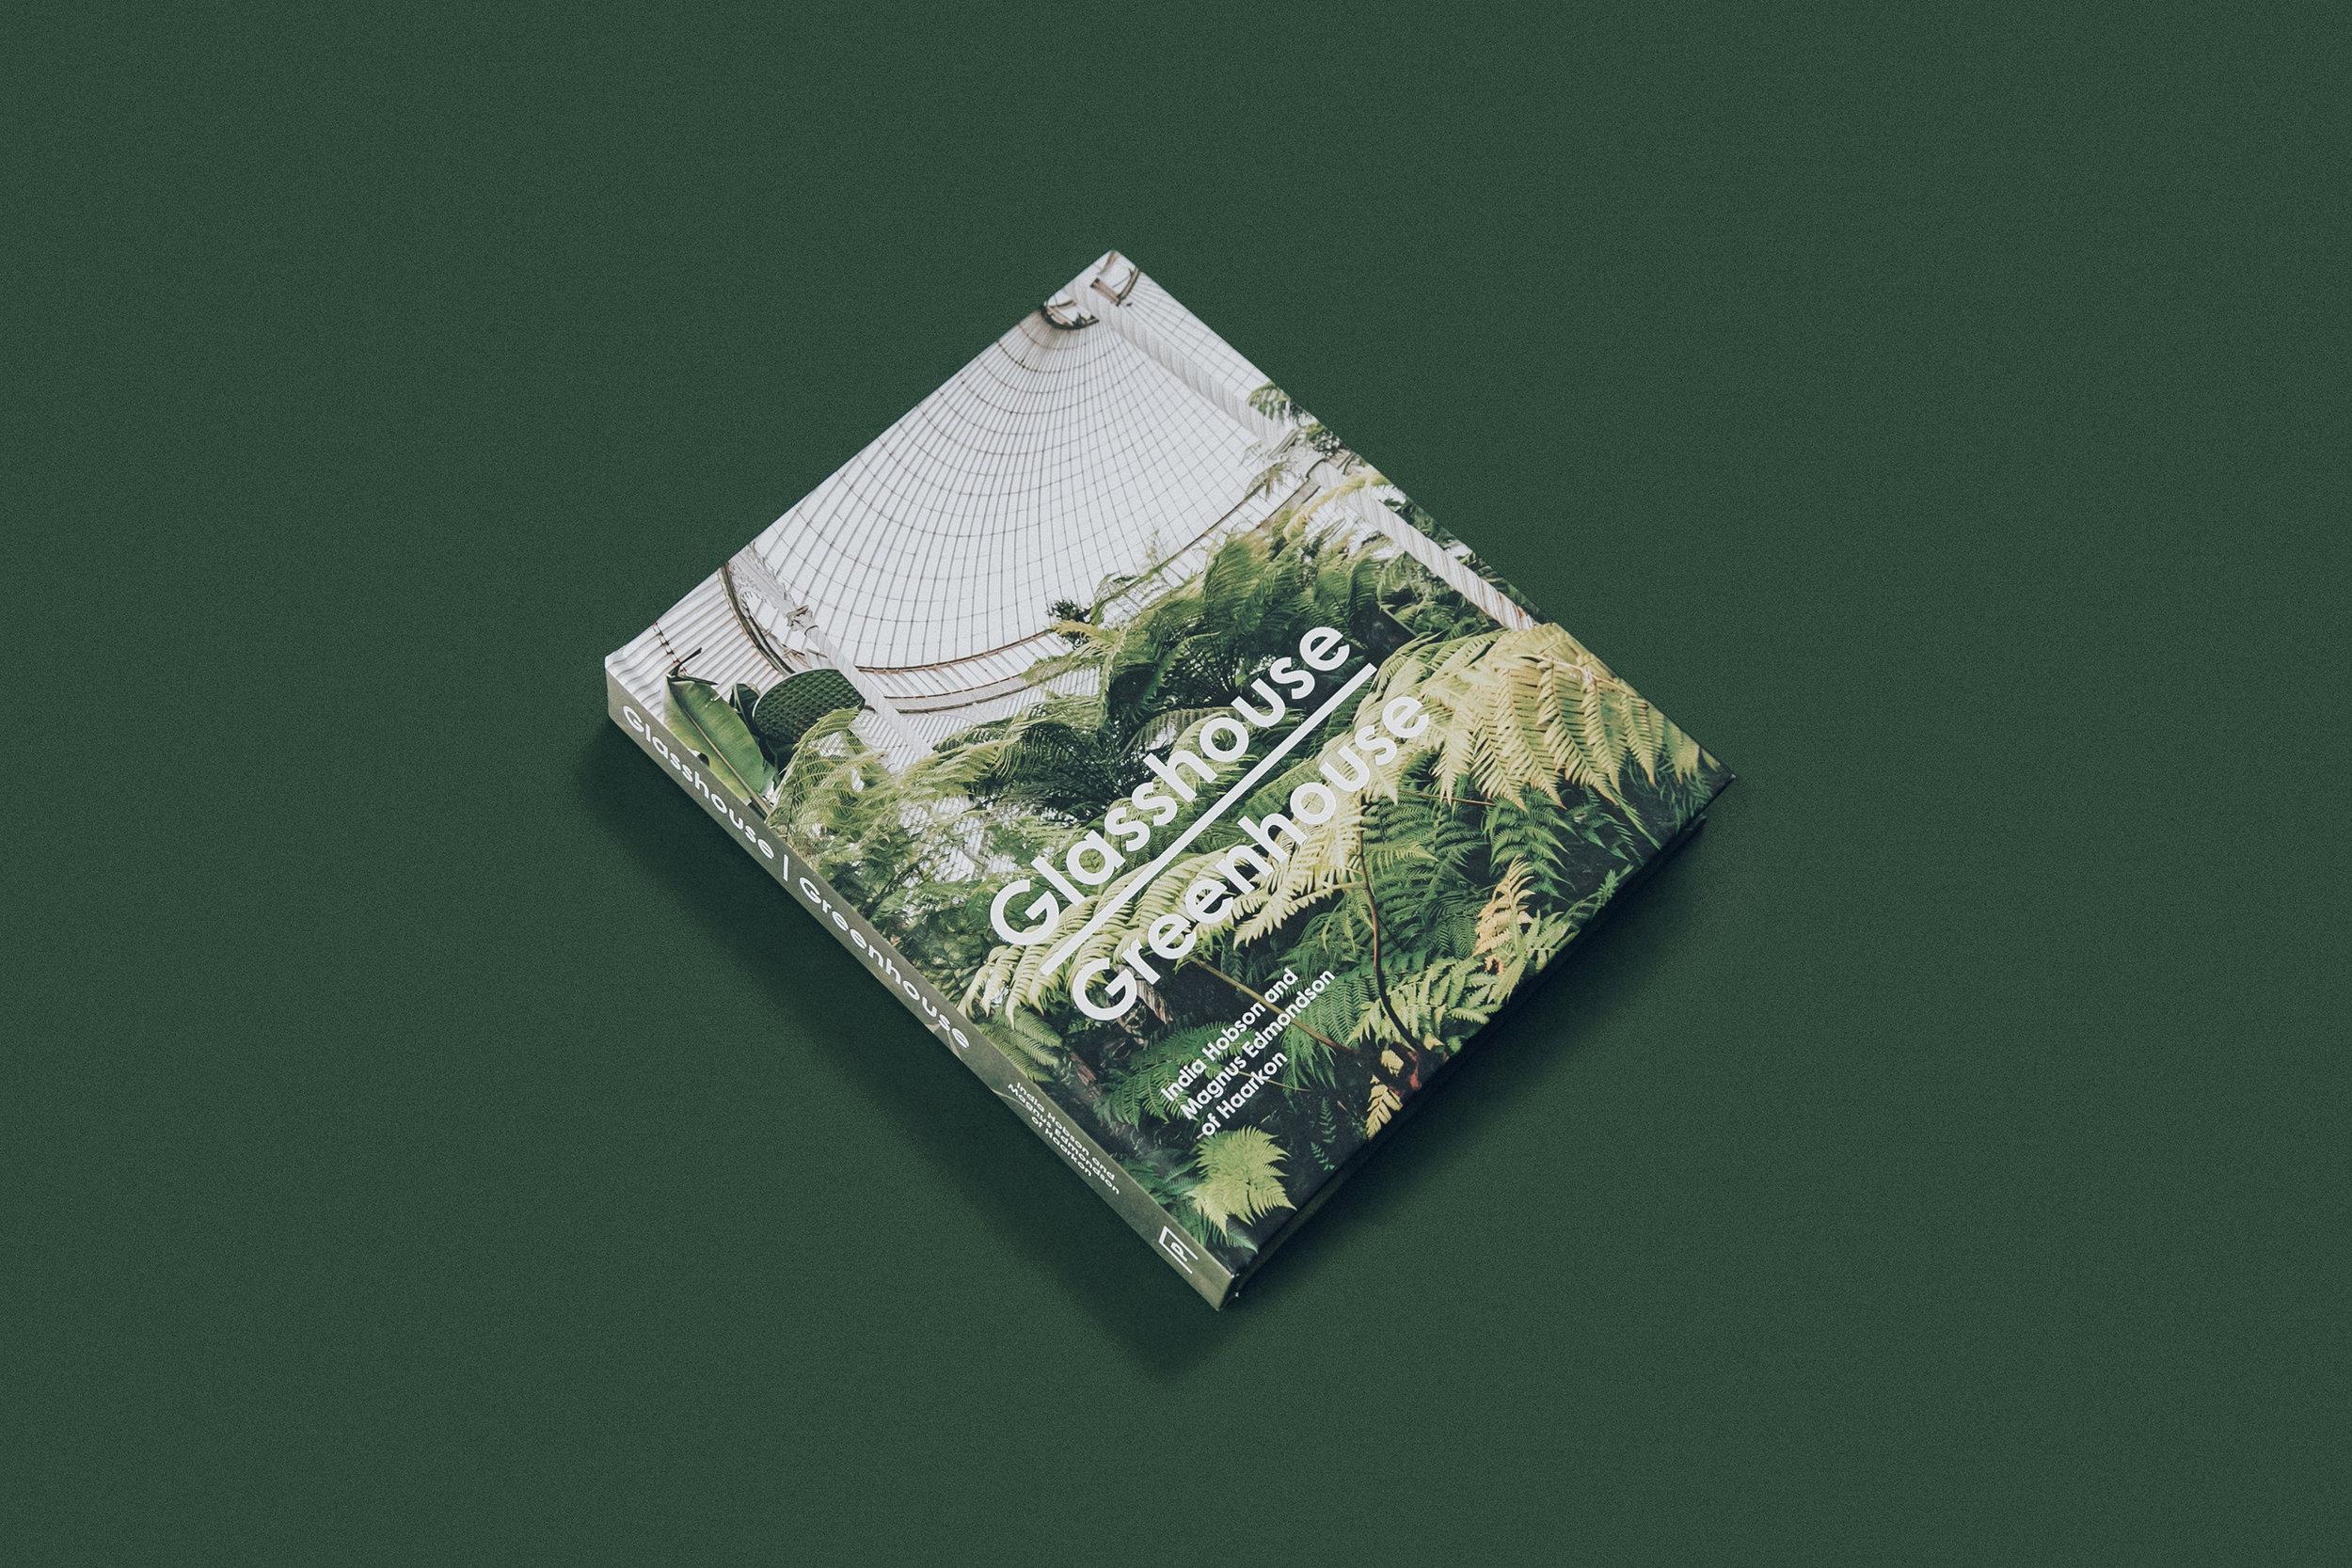 Glasshouse Greenhouse by India Hobson and Magnus Edmondson Haarkon